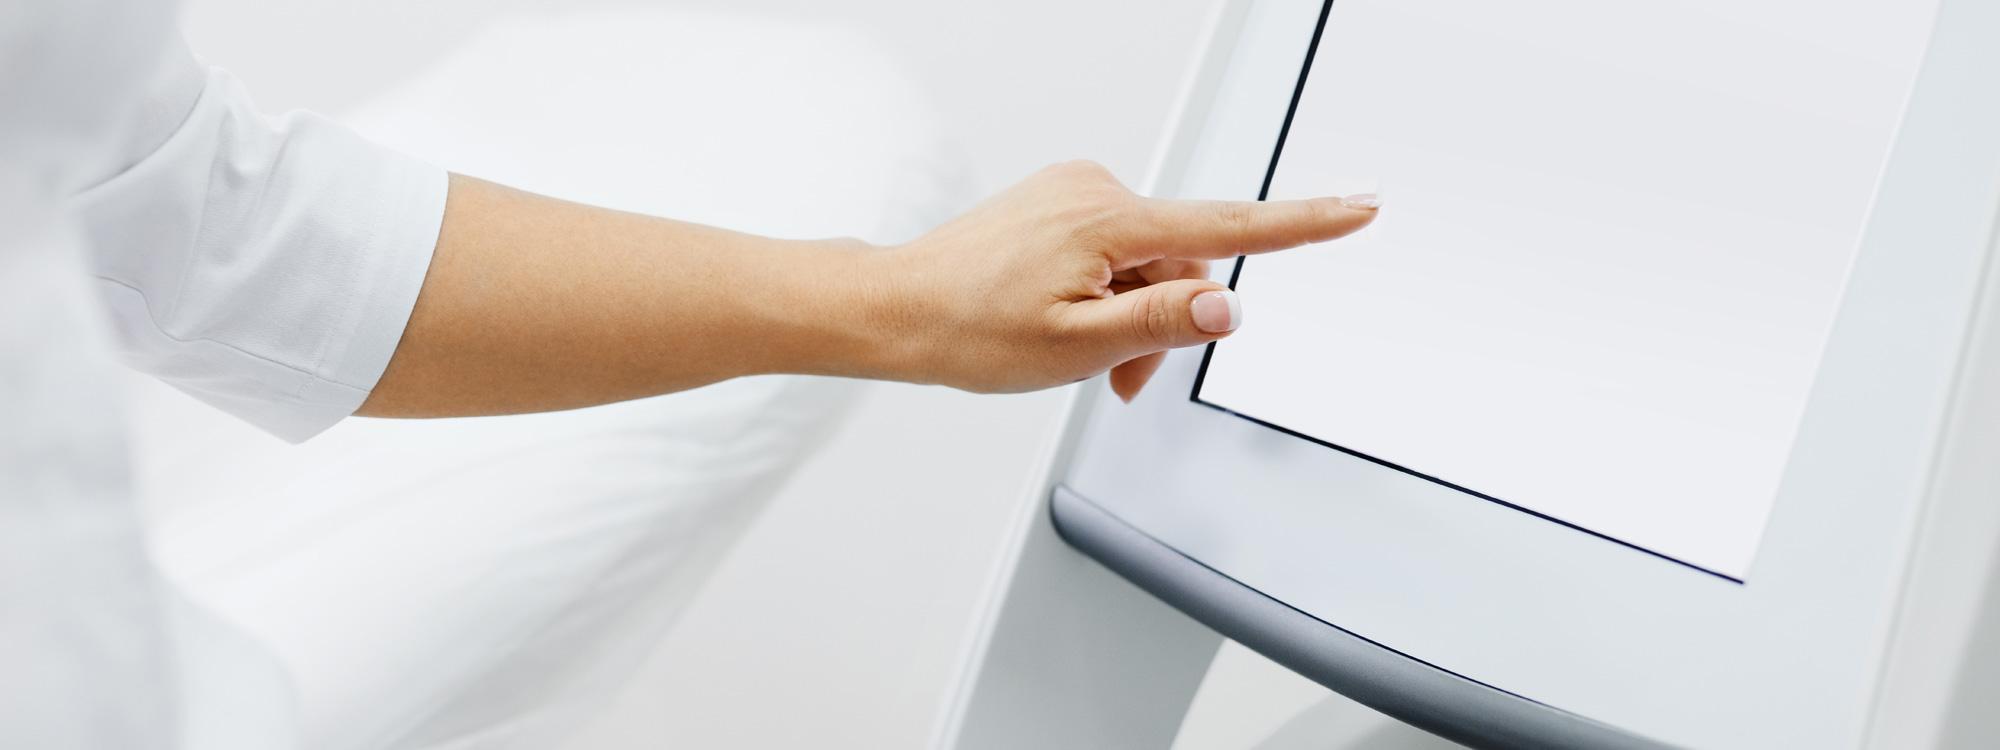 clmo centre laser dermatologique lyon aix en provence st etienne epilation d finitive au laser. Black Bedroom Furniture Sets. Home Design Ideas